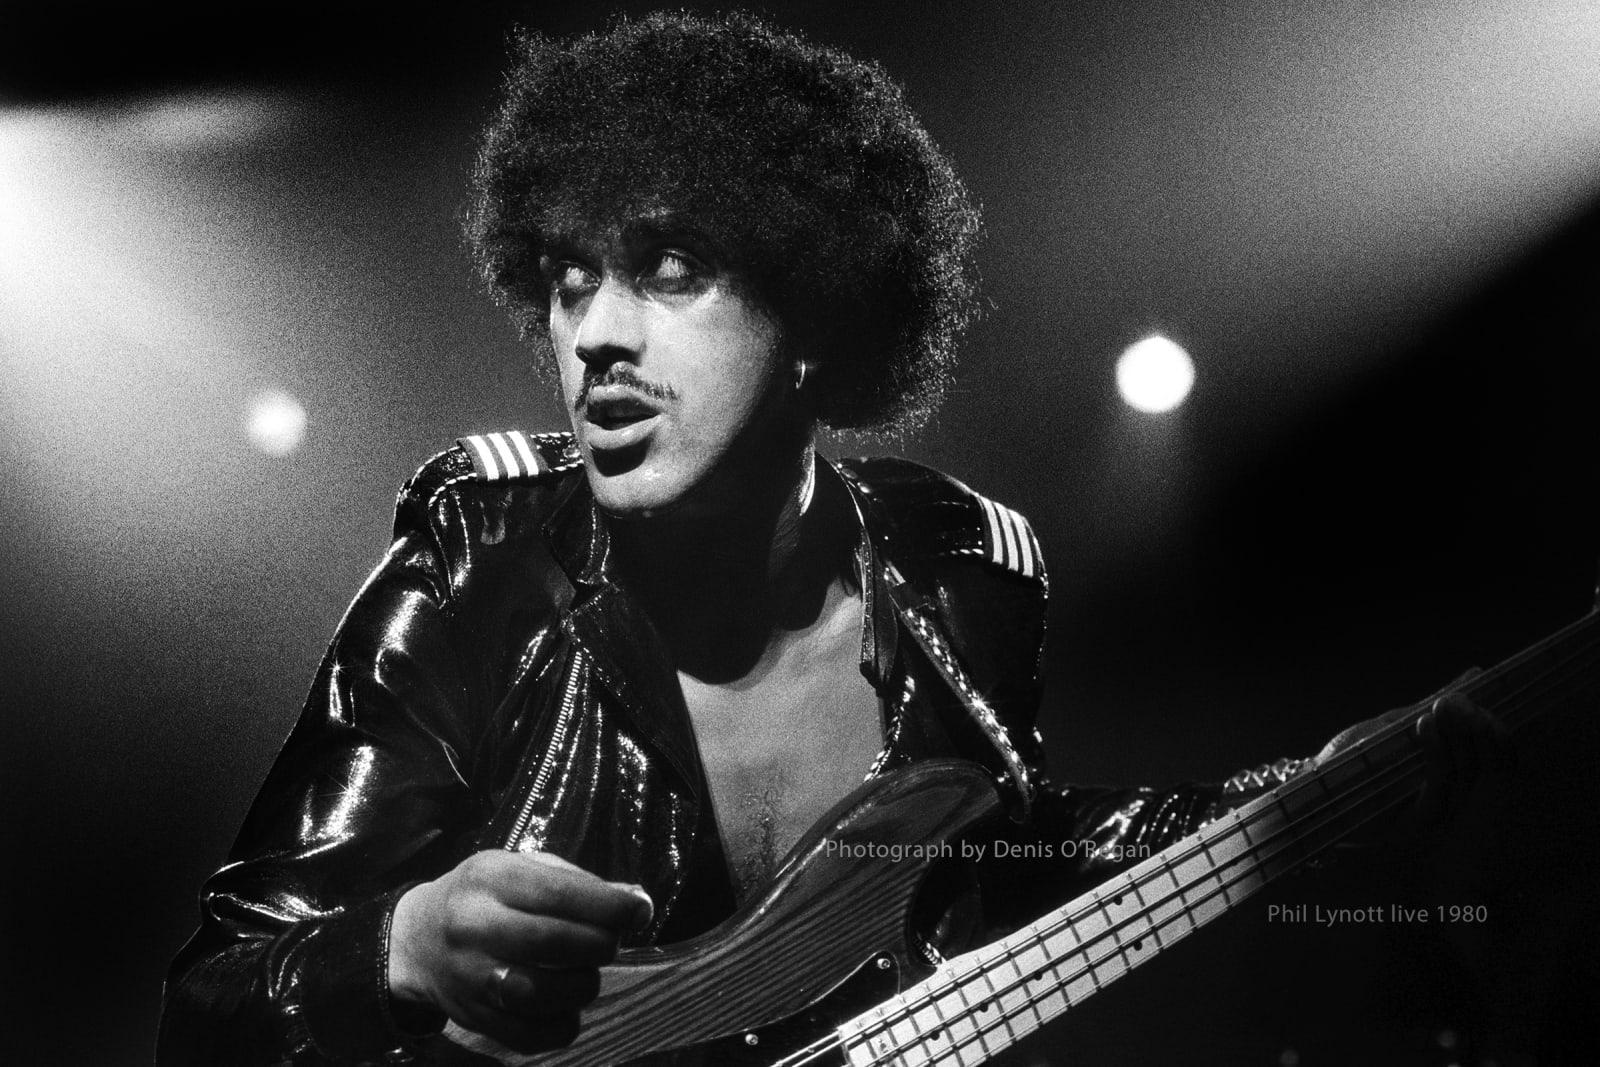 THIN LIZZY, Phil Lynott Thin Lizzy live, 1981